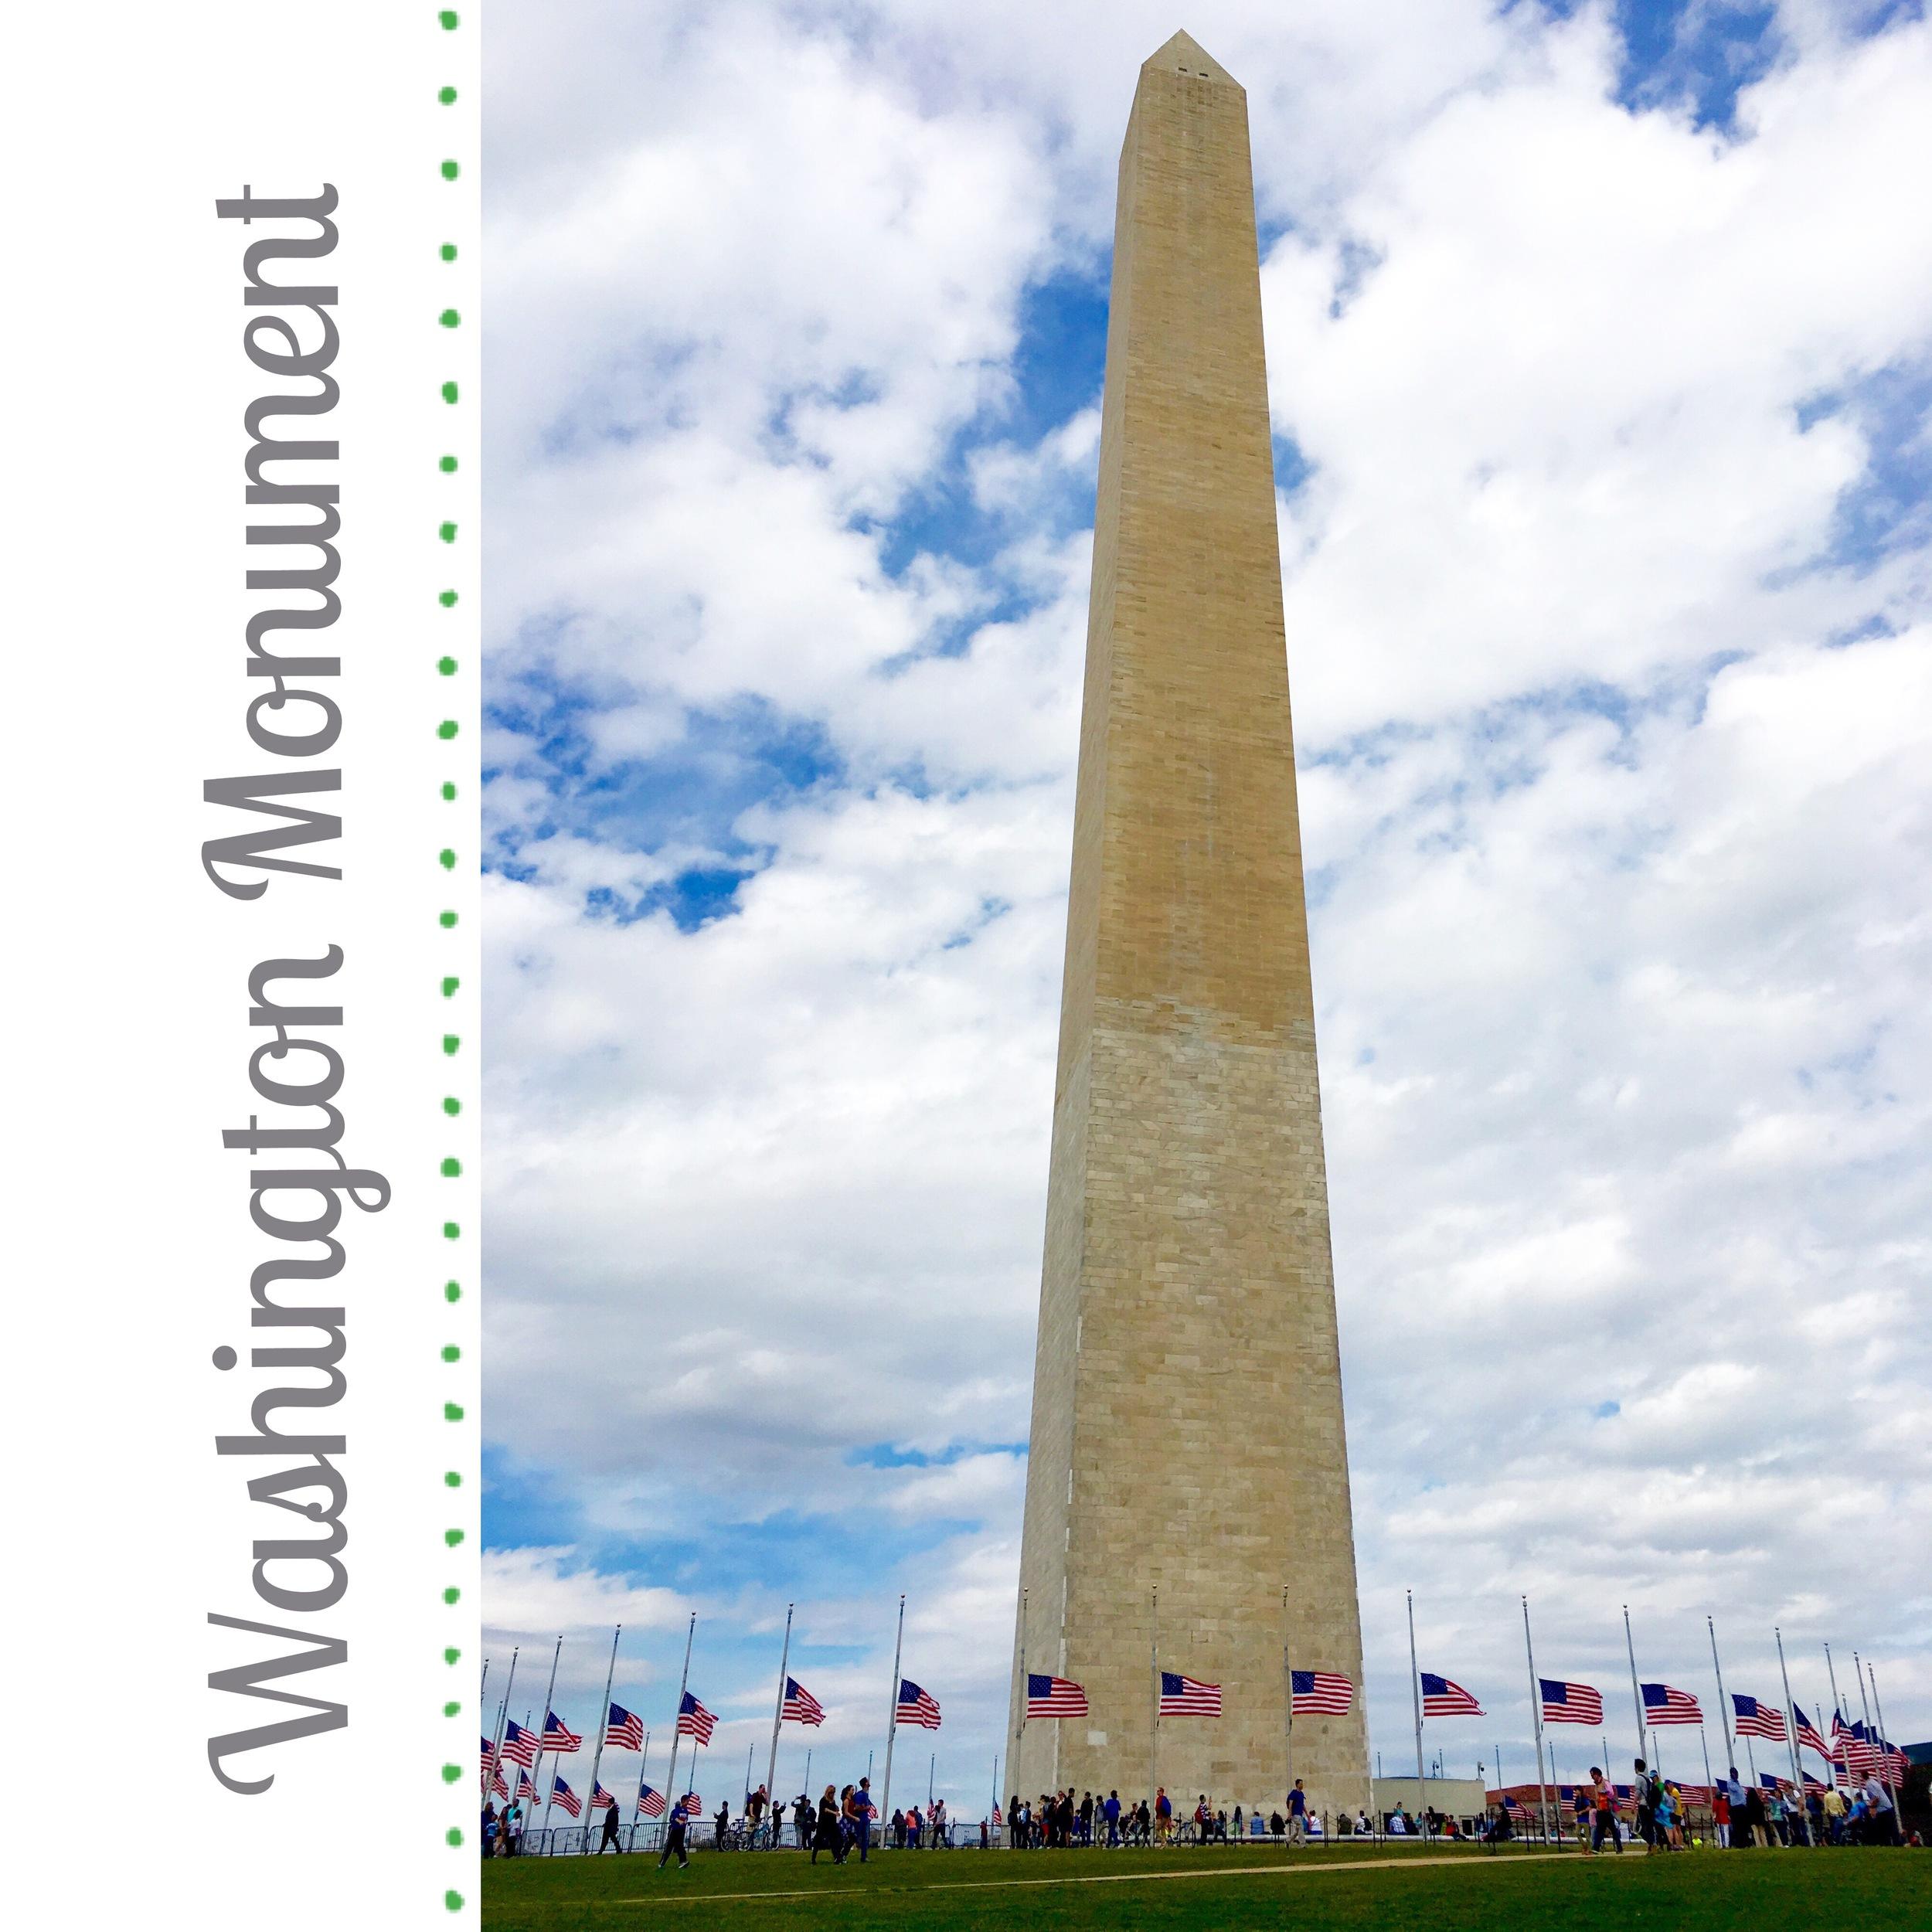 washington-monument-washington-dc-apeachlife.jpg